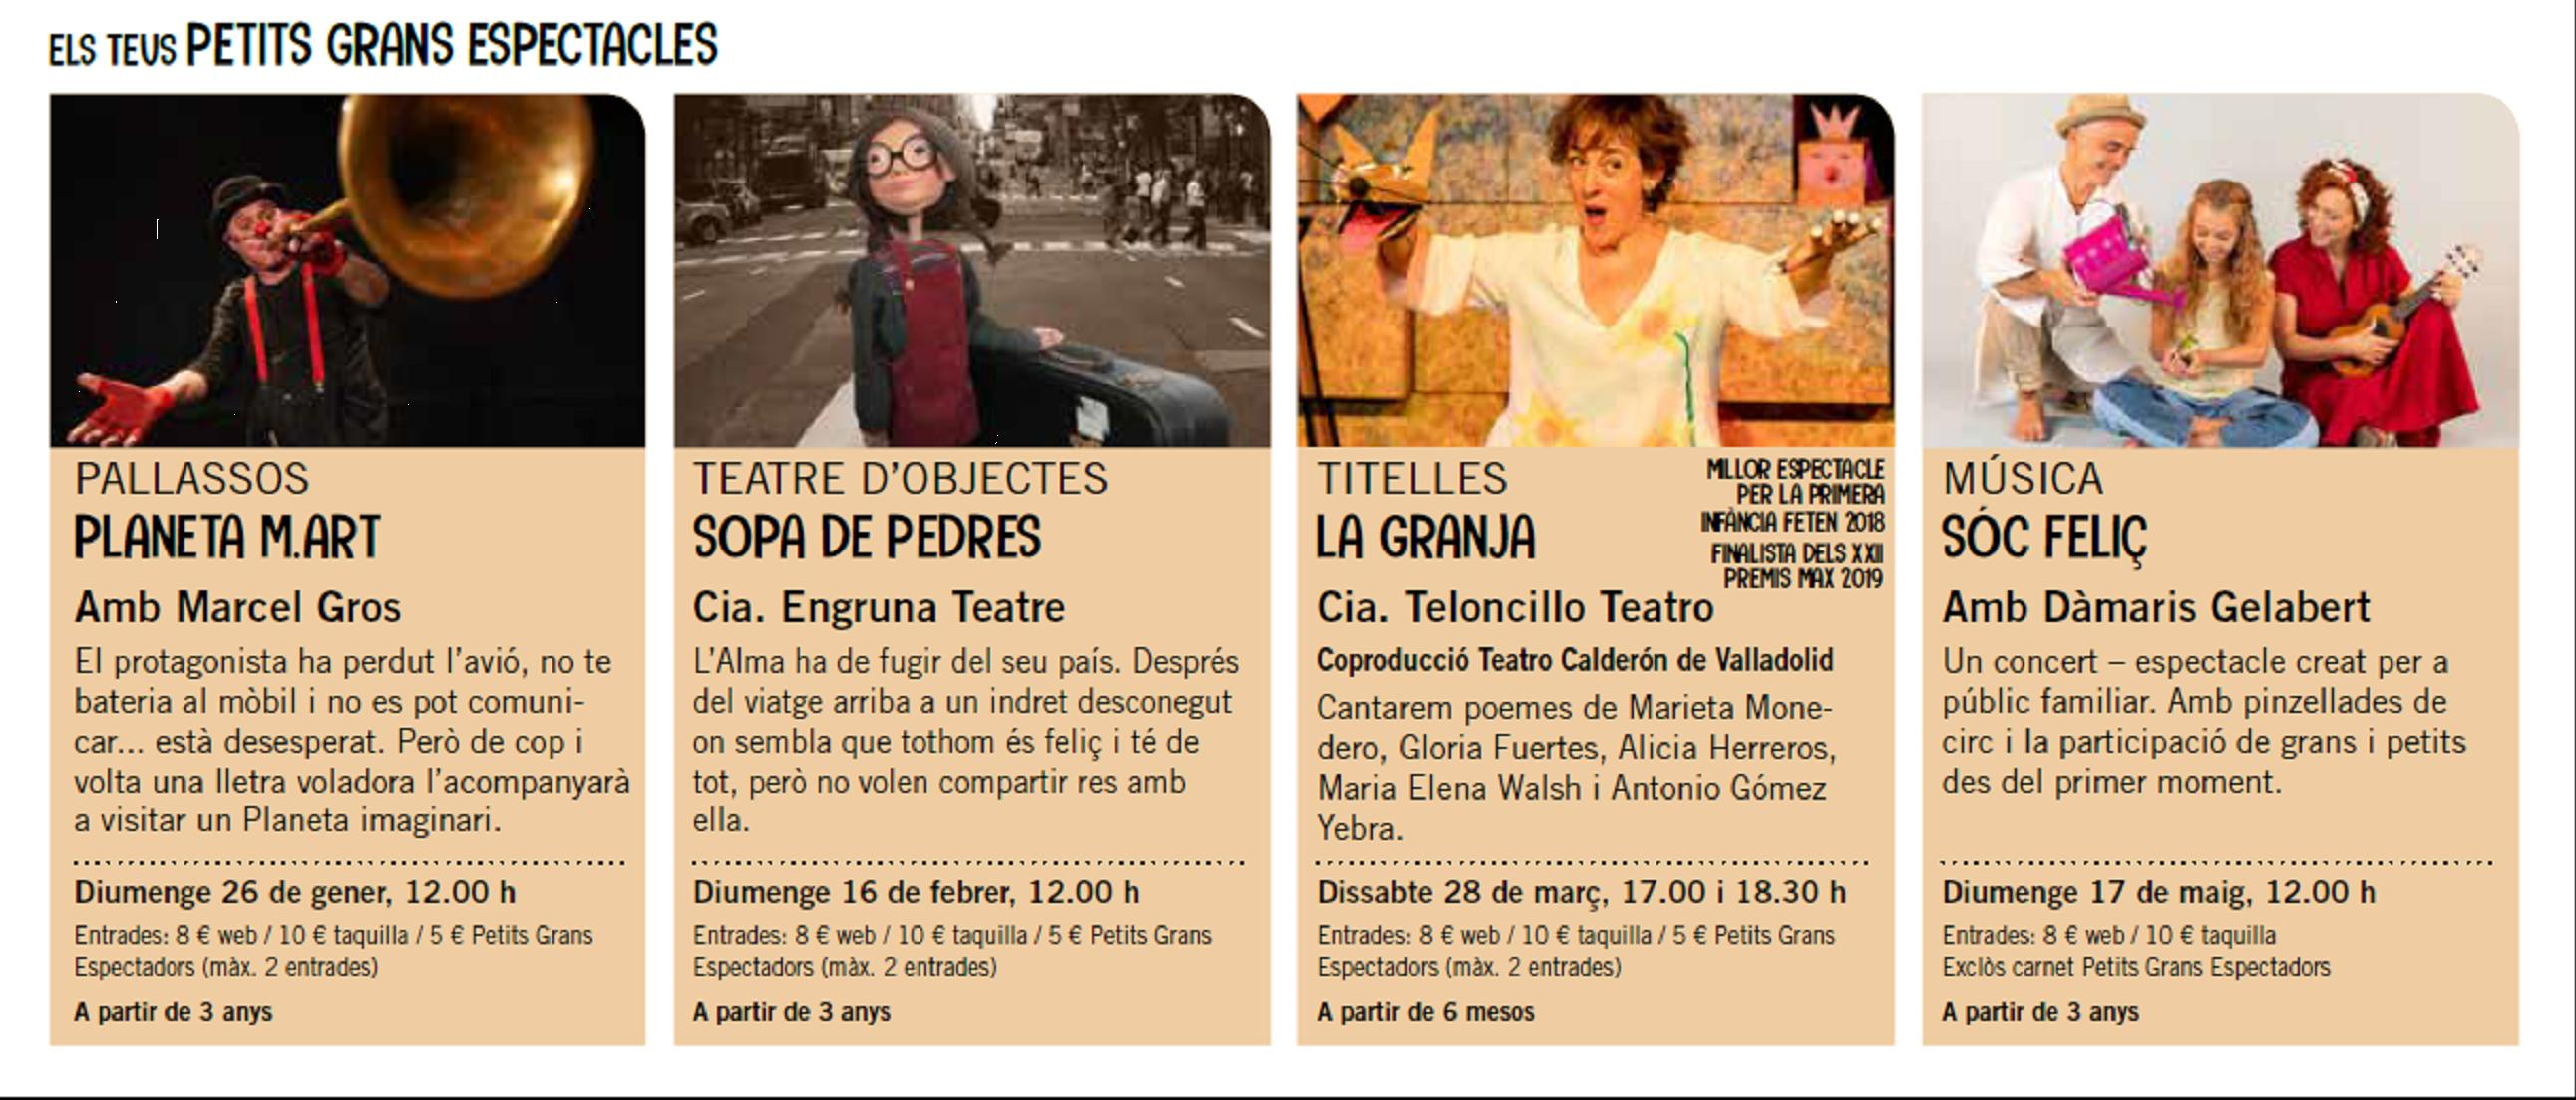 Petits grans espectacles Teatre Nuria Espert 2020